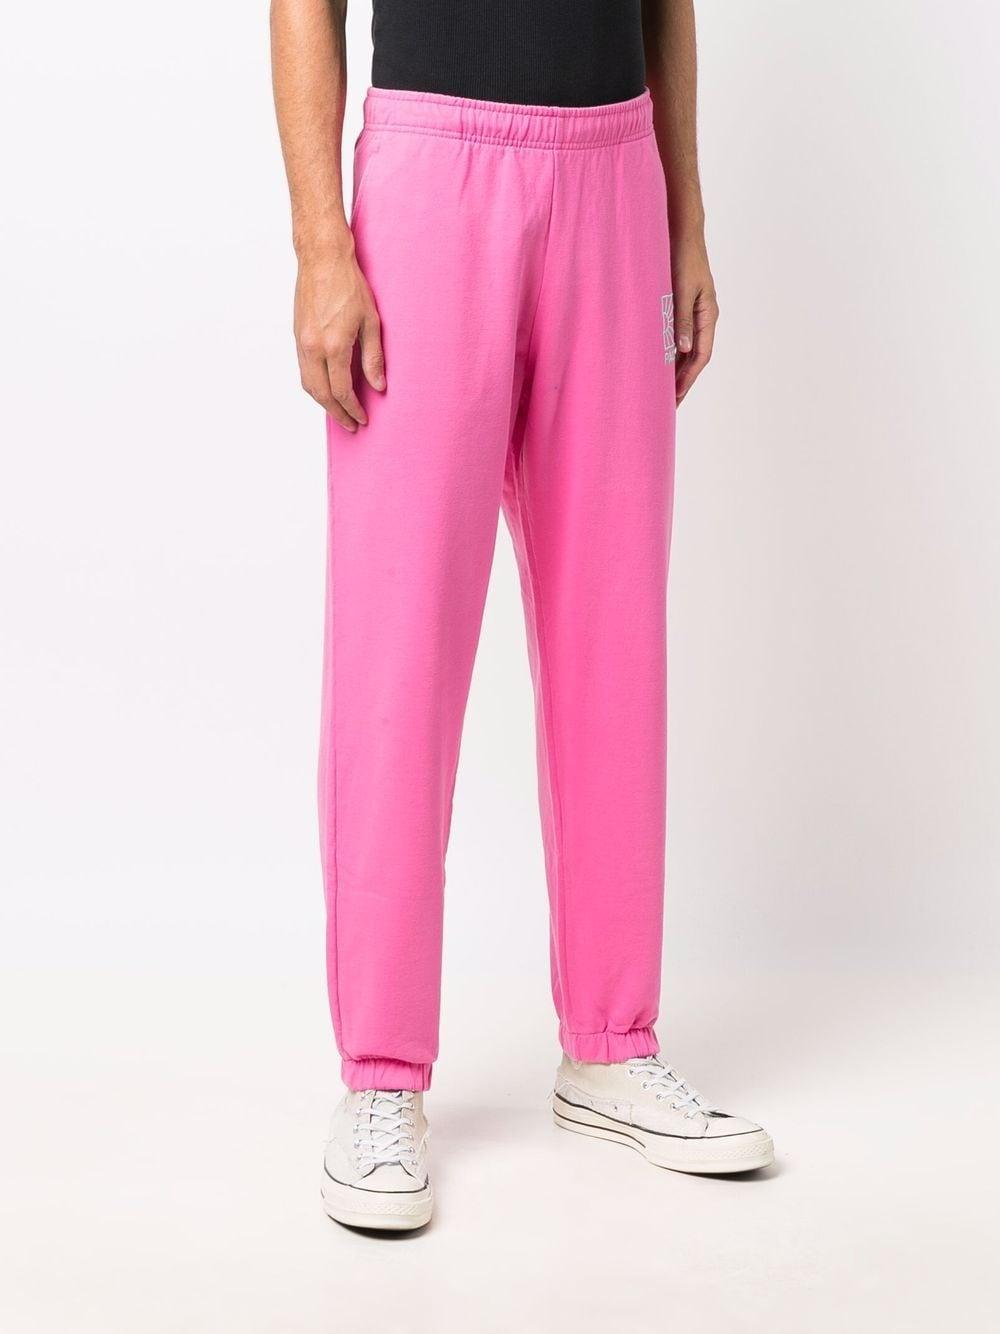 sportes pants man pink in cotton RASSVET | Trousers | PACC9P0034